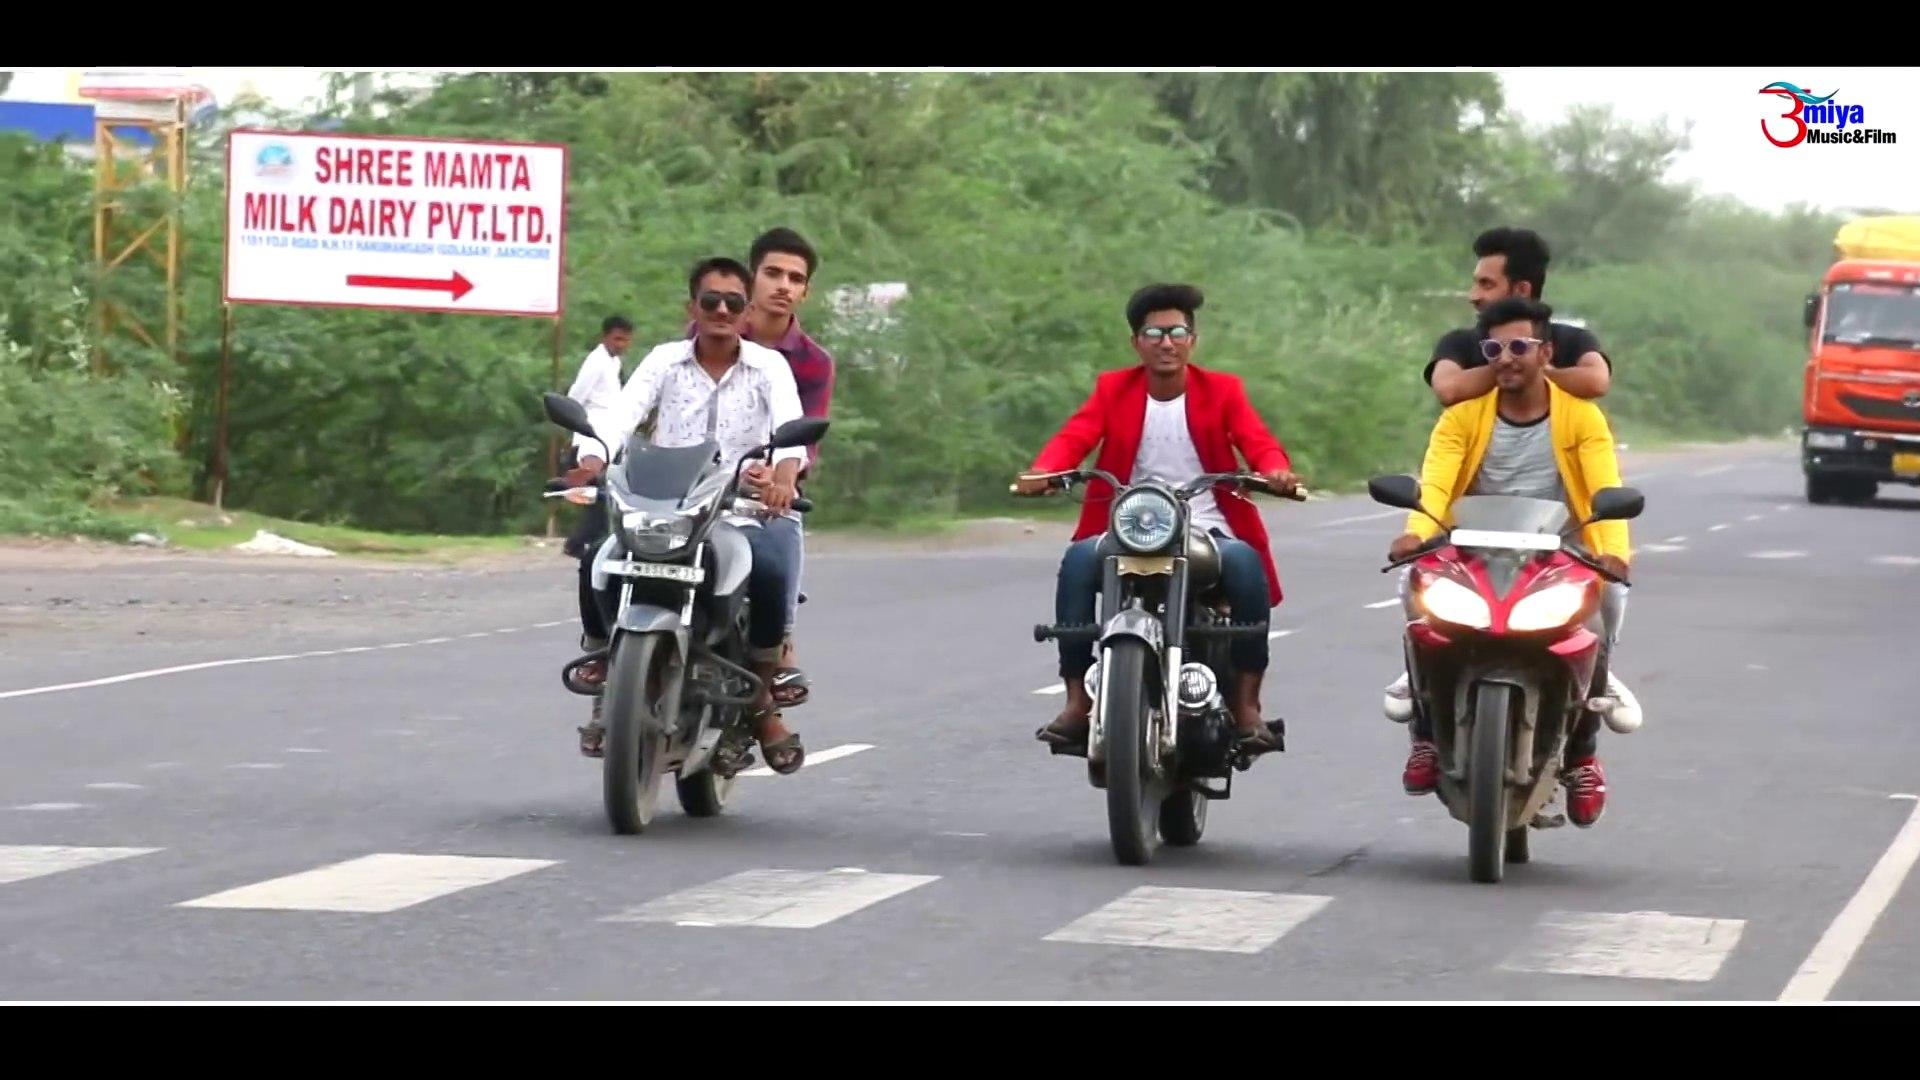 Dosti Songs | City Boys v/s Desi Boys - Heart Touching Story | Latest Songs | New Hindi Song 2019 |